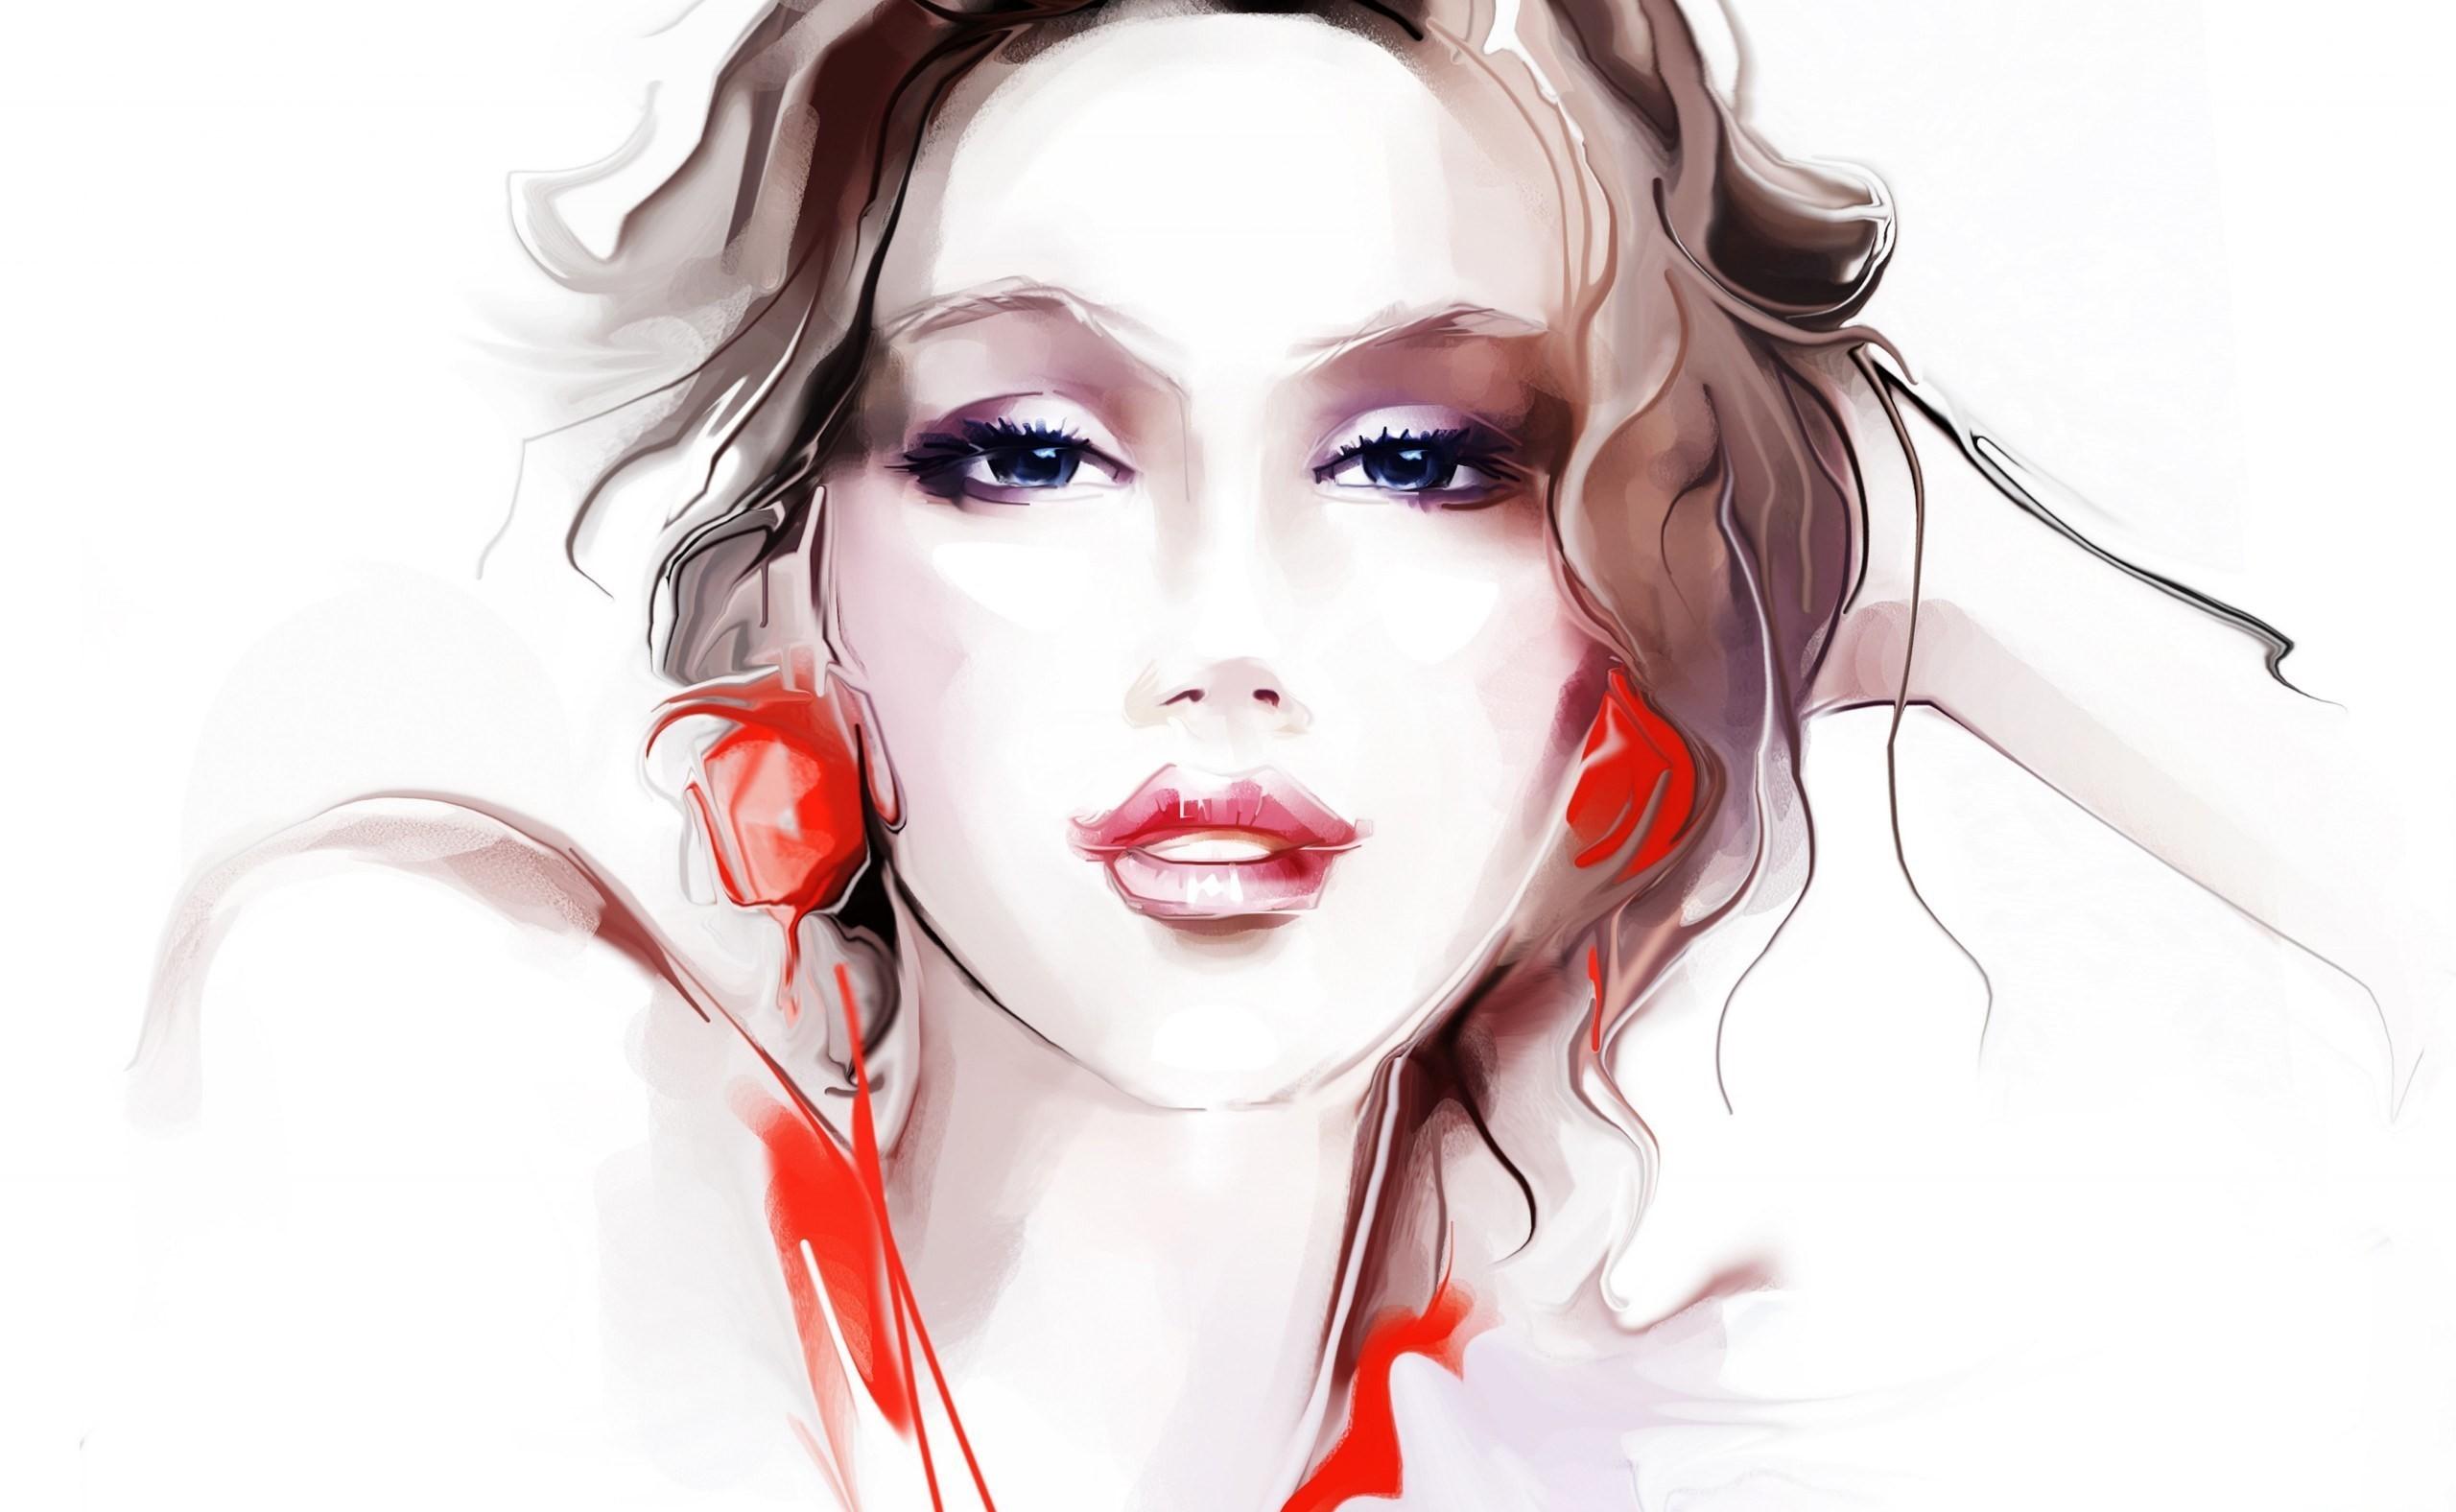 Wallpaper face drawing women artwork cartoon mouth - Cartoon girl images hd ...